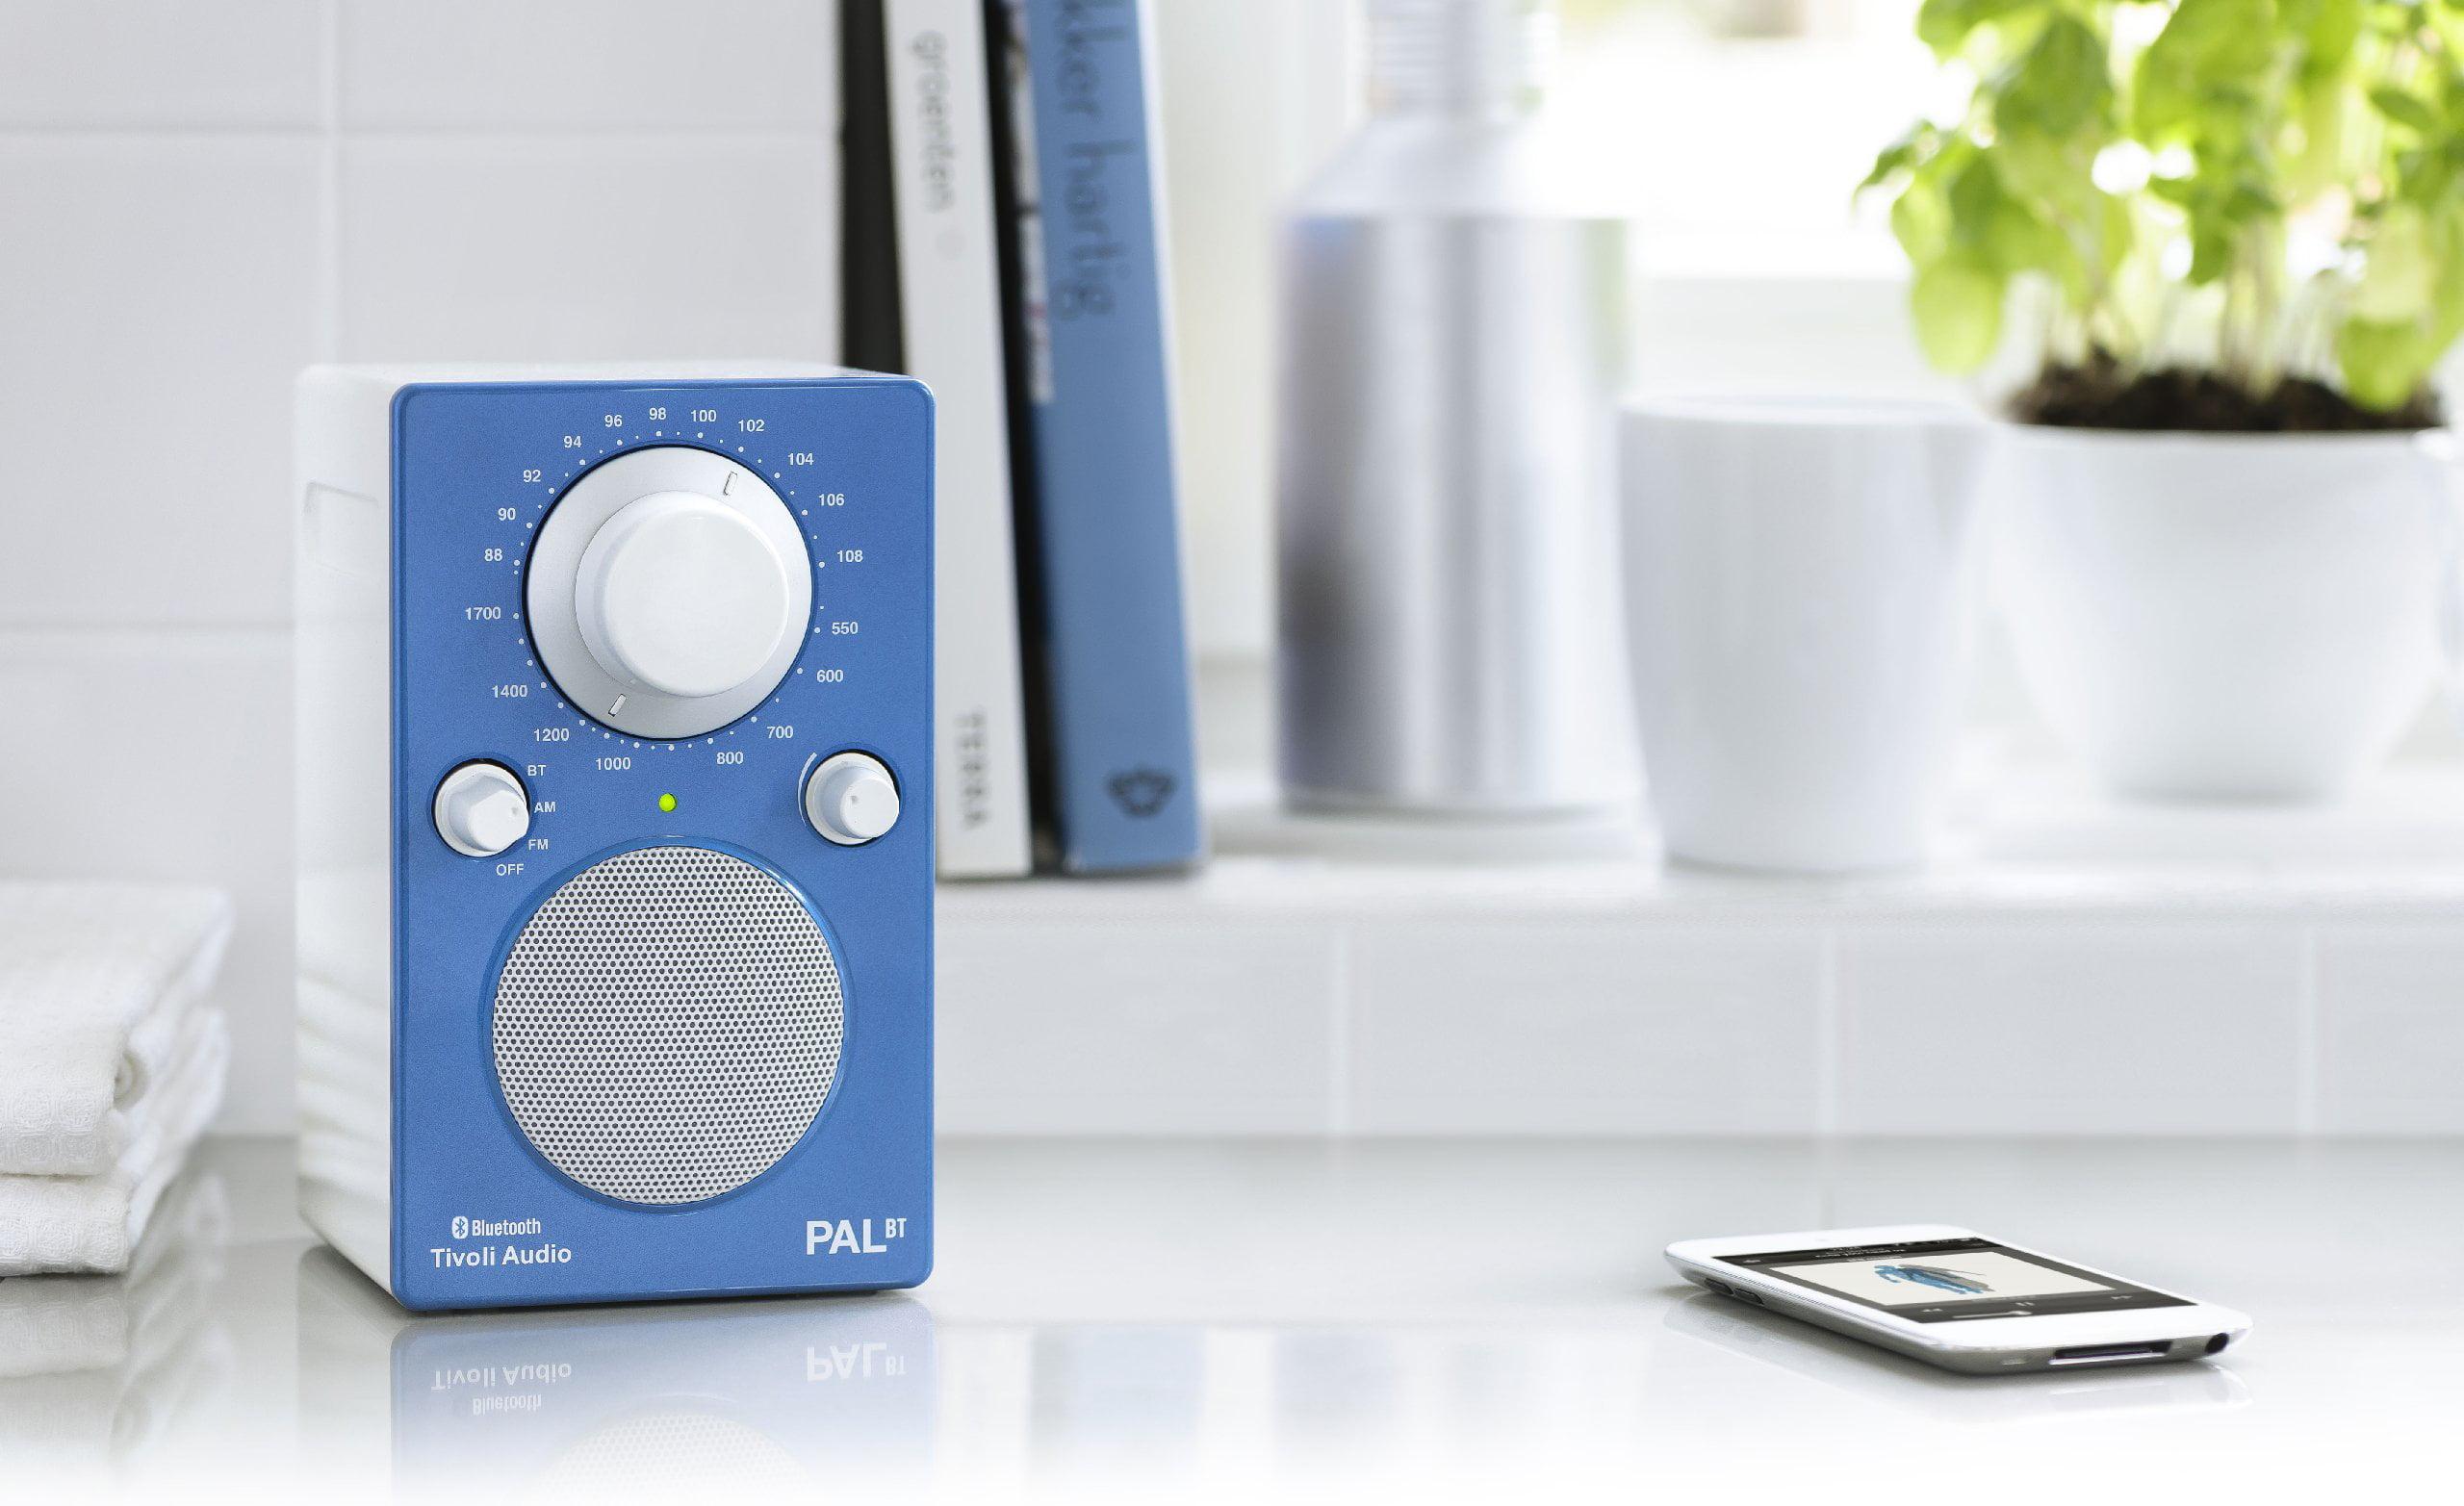 Tivoli Audio Pal BT Bluetooth Portable Radio, Glossy Blue White by Tivoli Audio